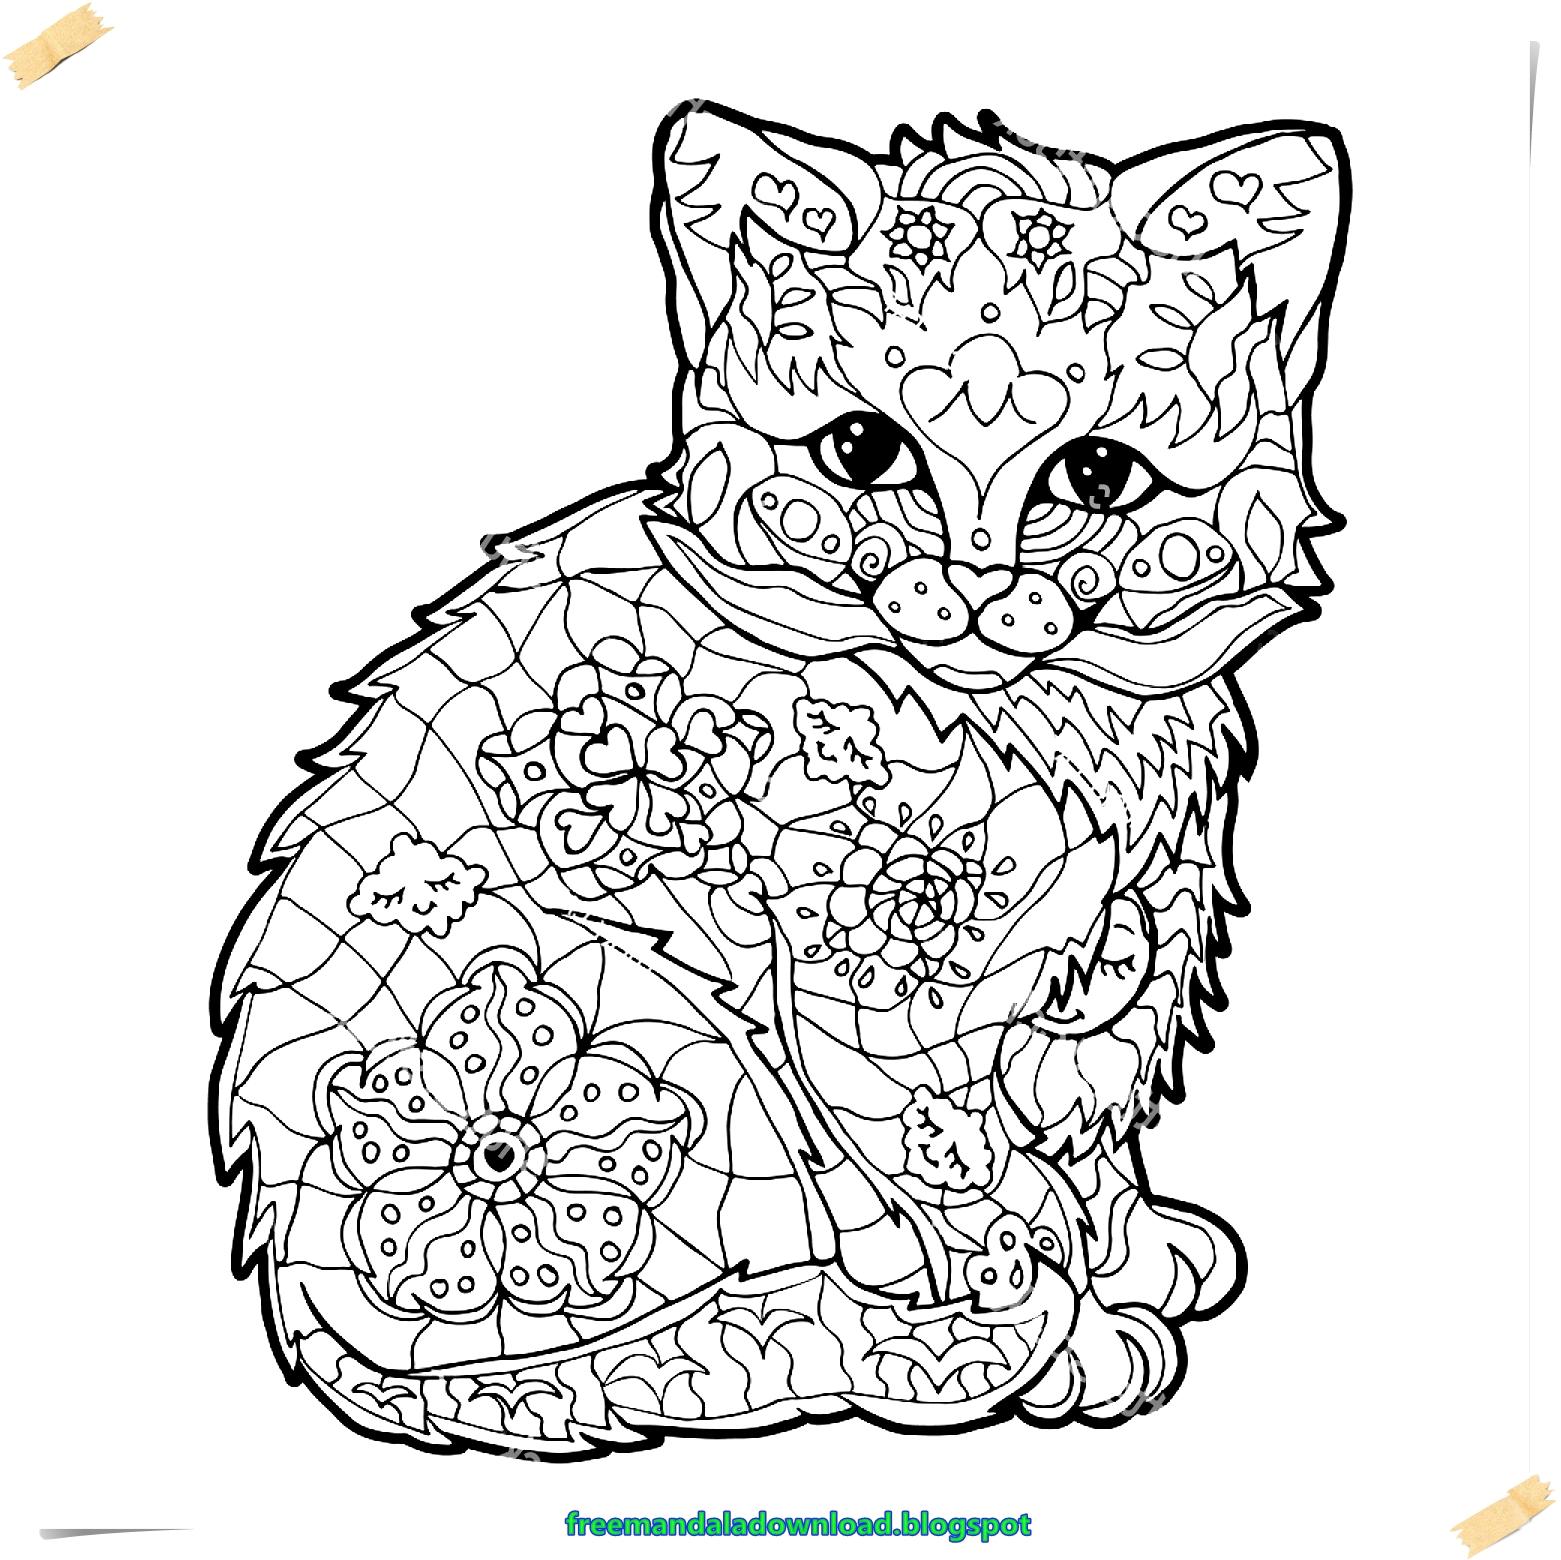 Katzen Ausmalbilder Mandala : Erfreut Katzen Mandalas Zum Ausdrucken Bilder Malvorlagen Von